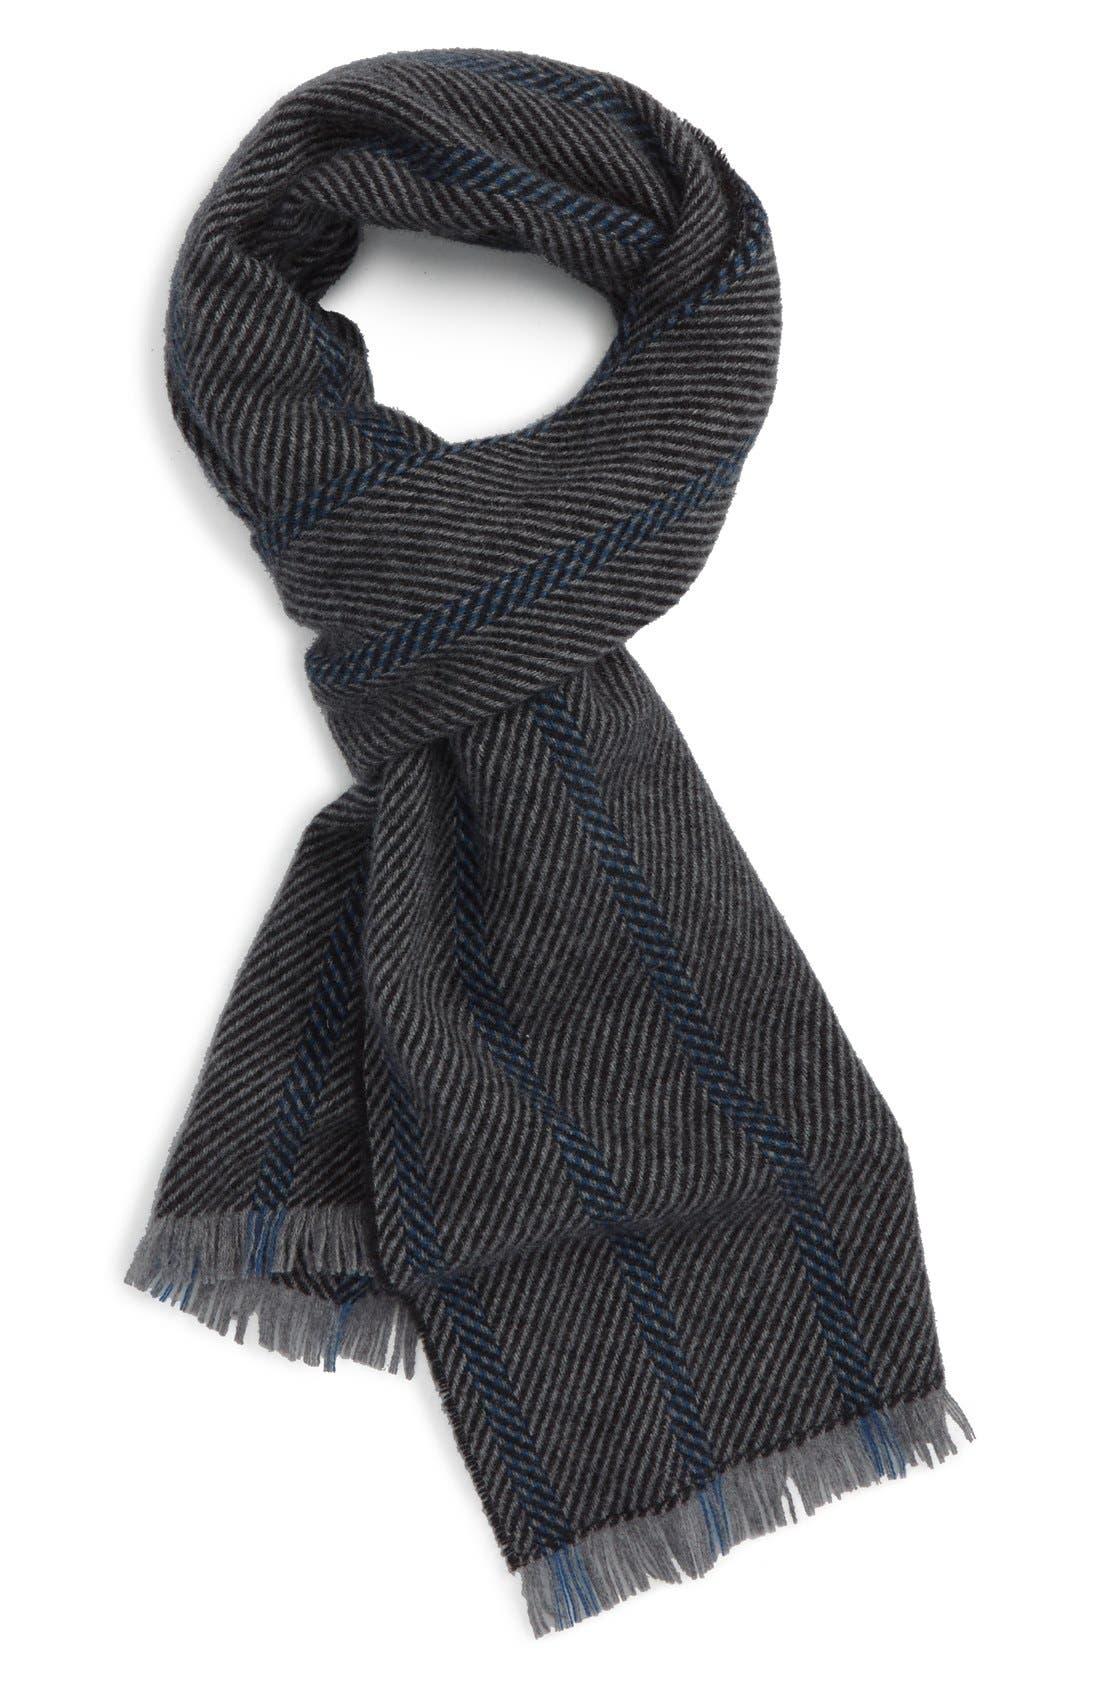 Stripe Cashmere Scarf,                         Main,                         color, Black/ Grey/ Cobalt